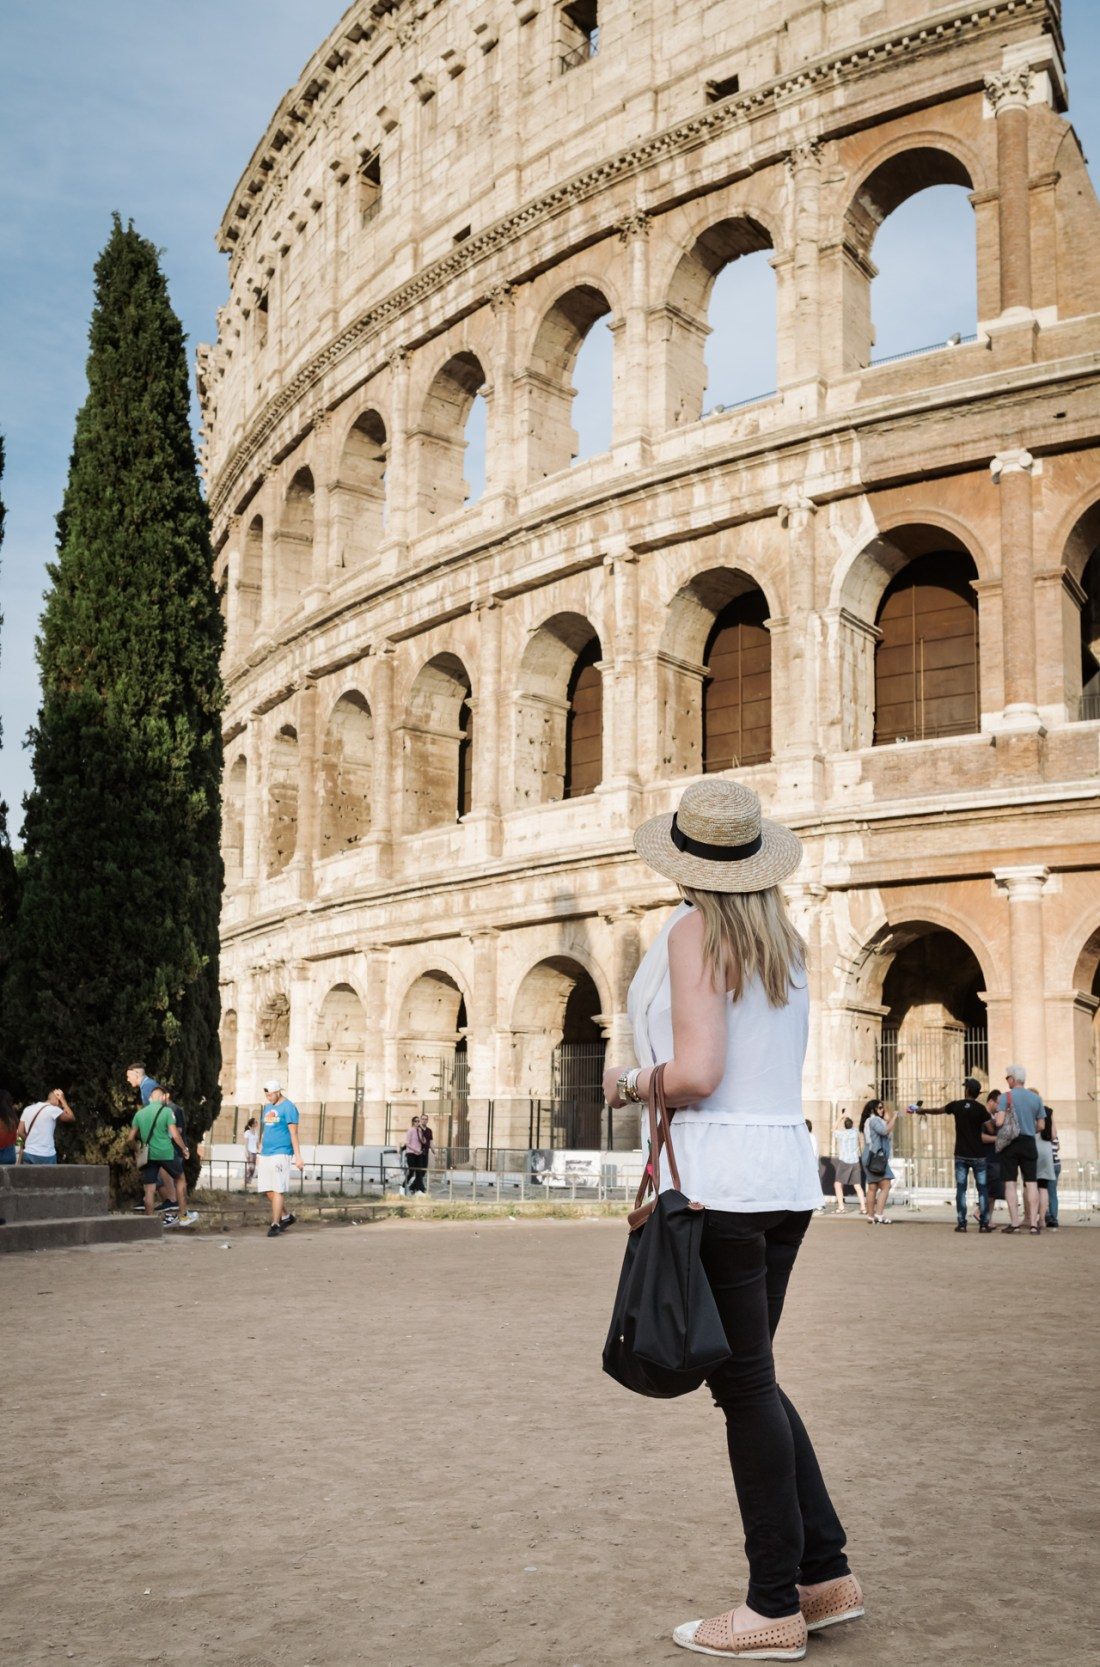 Colosseum Fancy Things Rome Italy Honeymoon